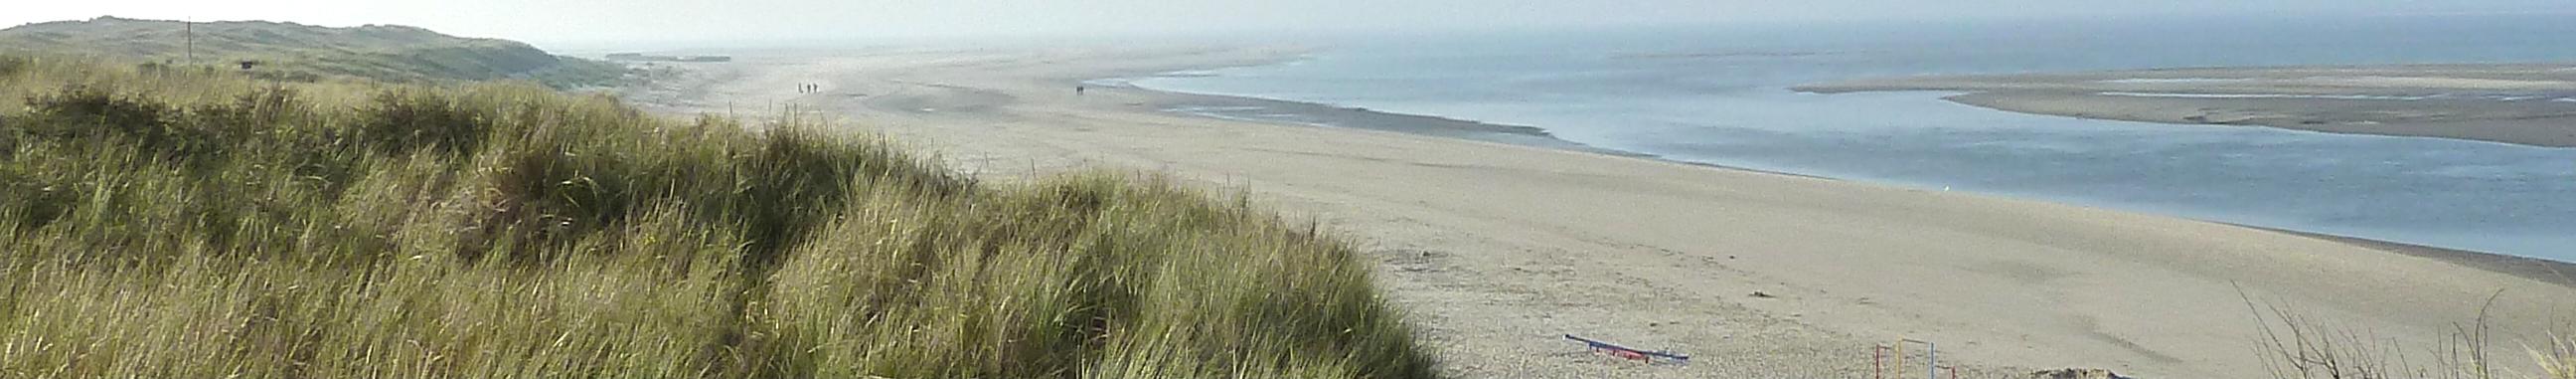 Küstenpanorama Nordeseeinsel